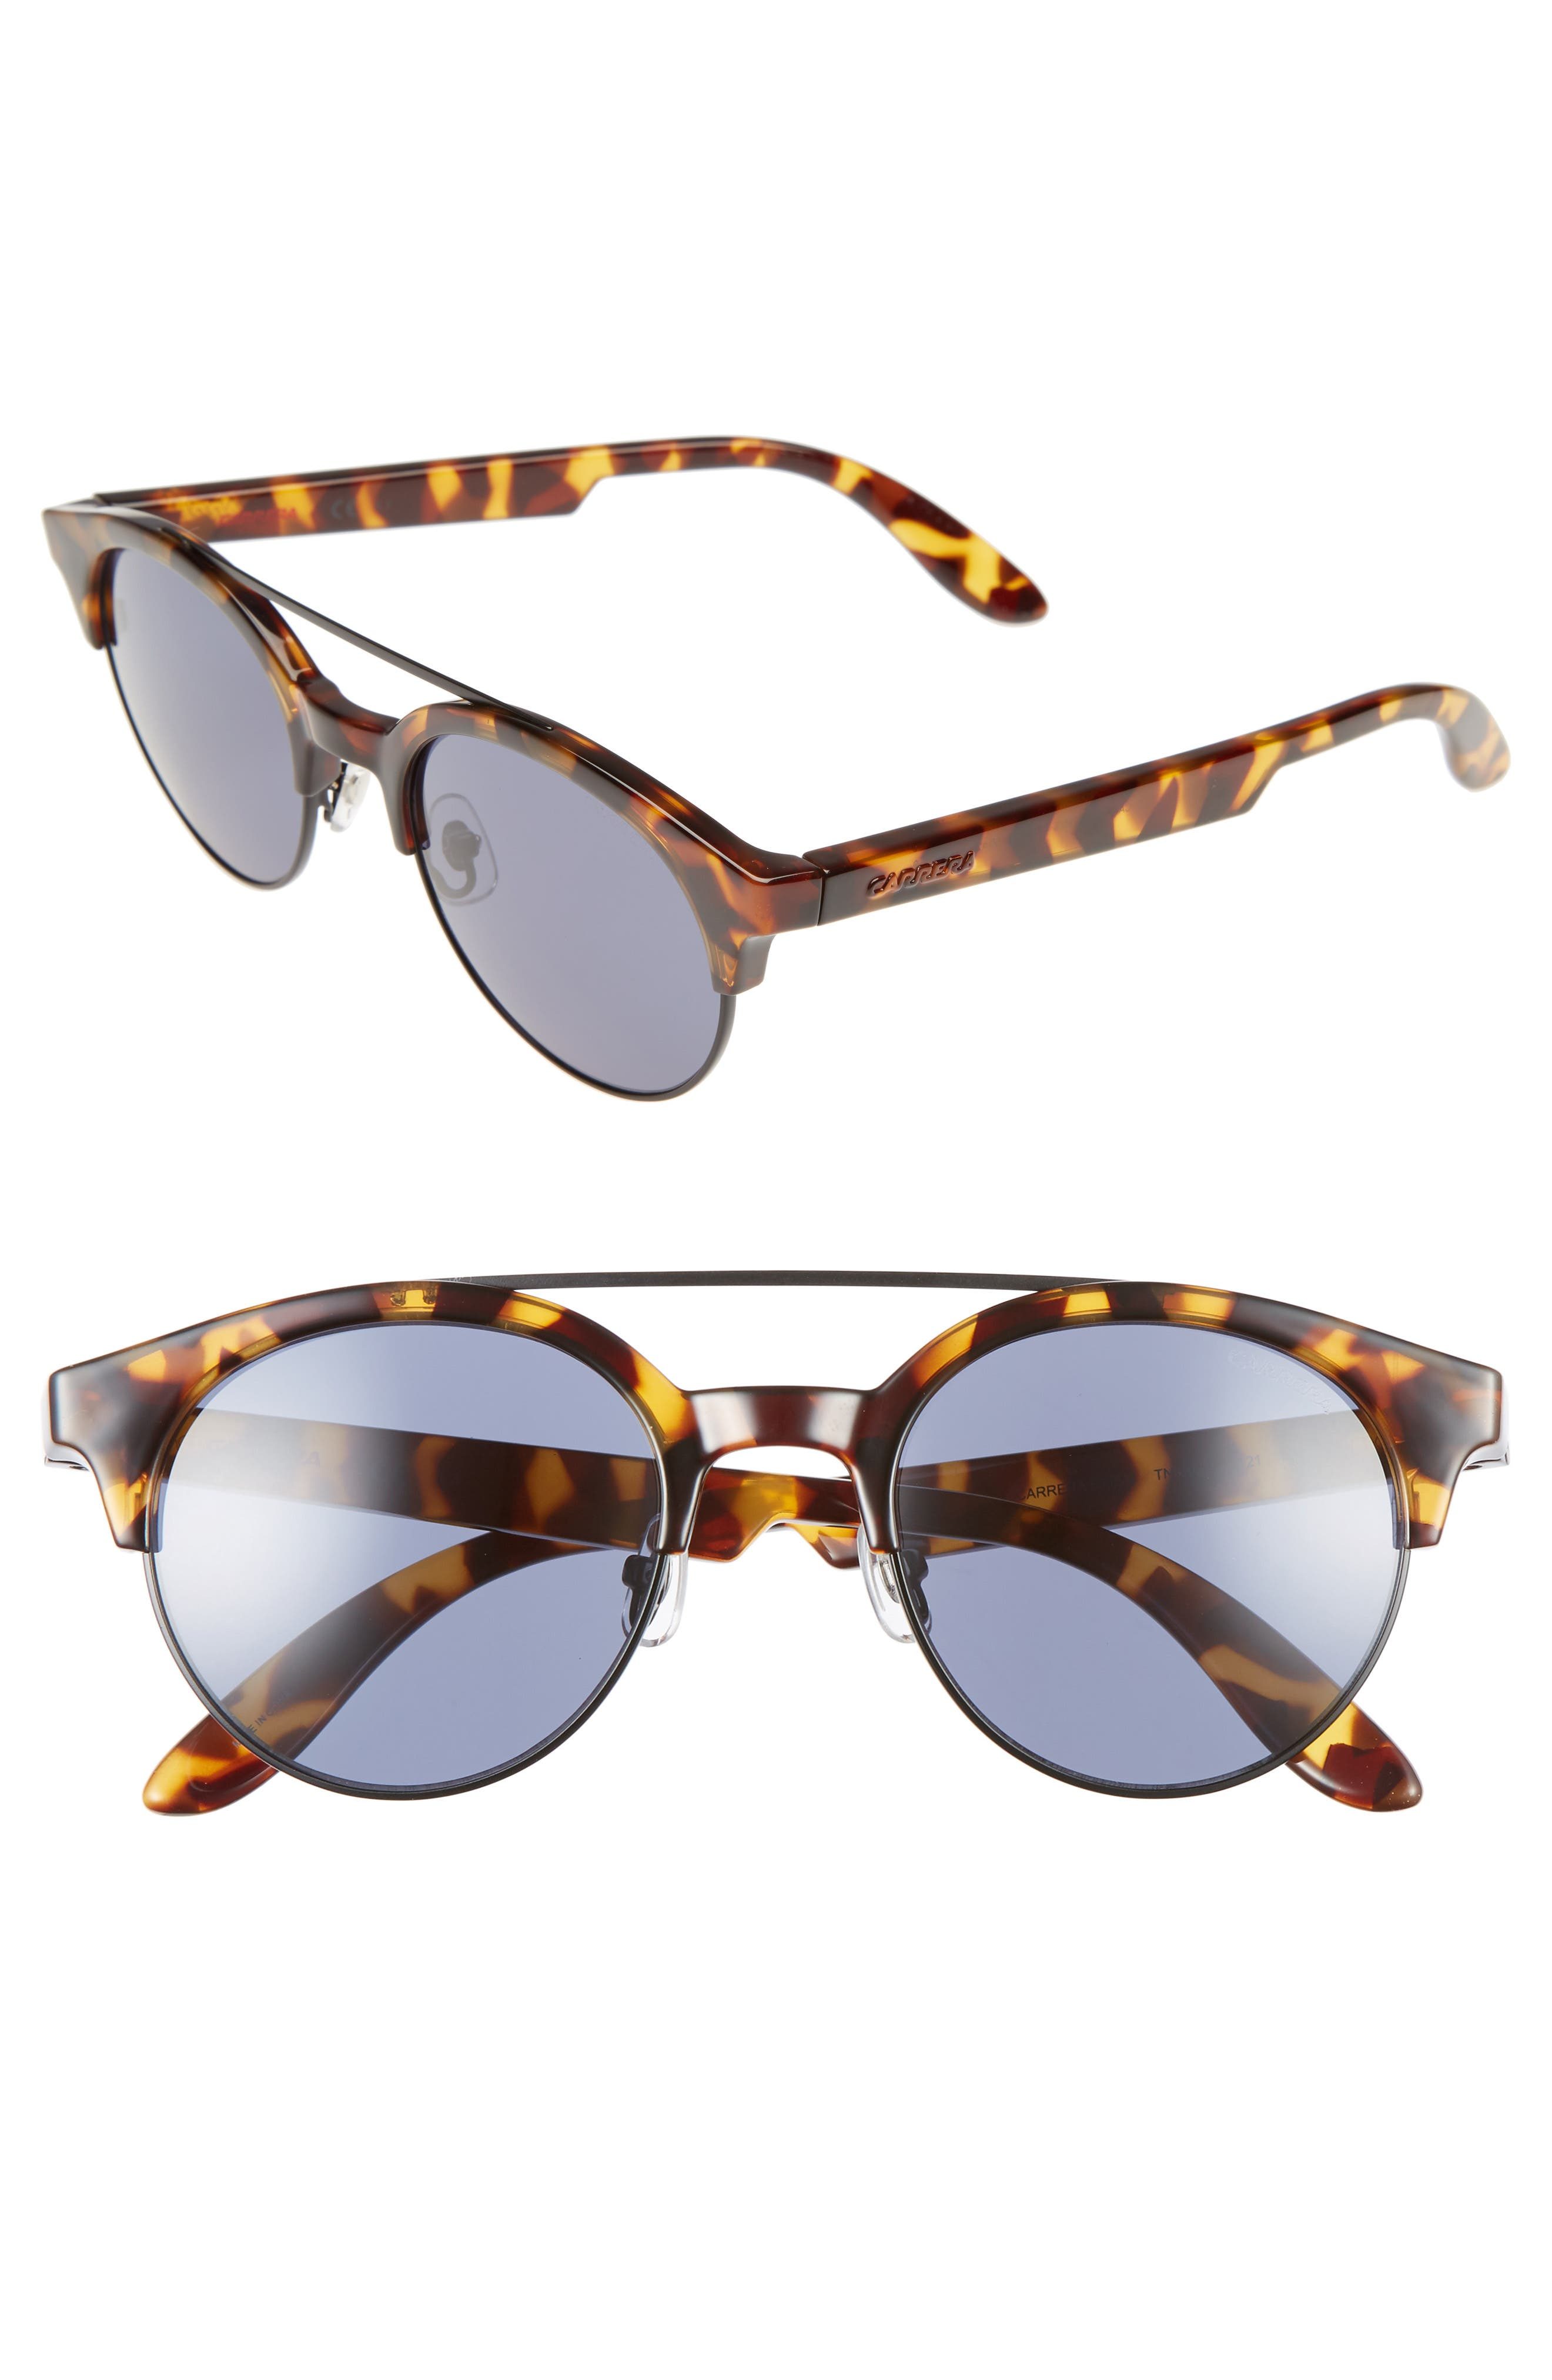 Retro 50mm Sunglasses,                         Main,                         color, Havana Black